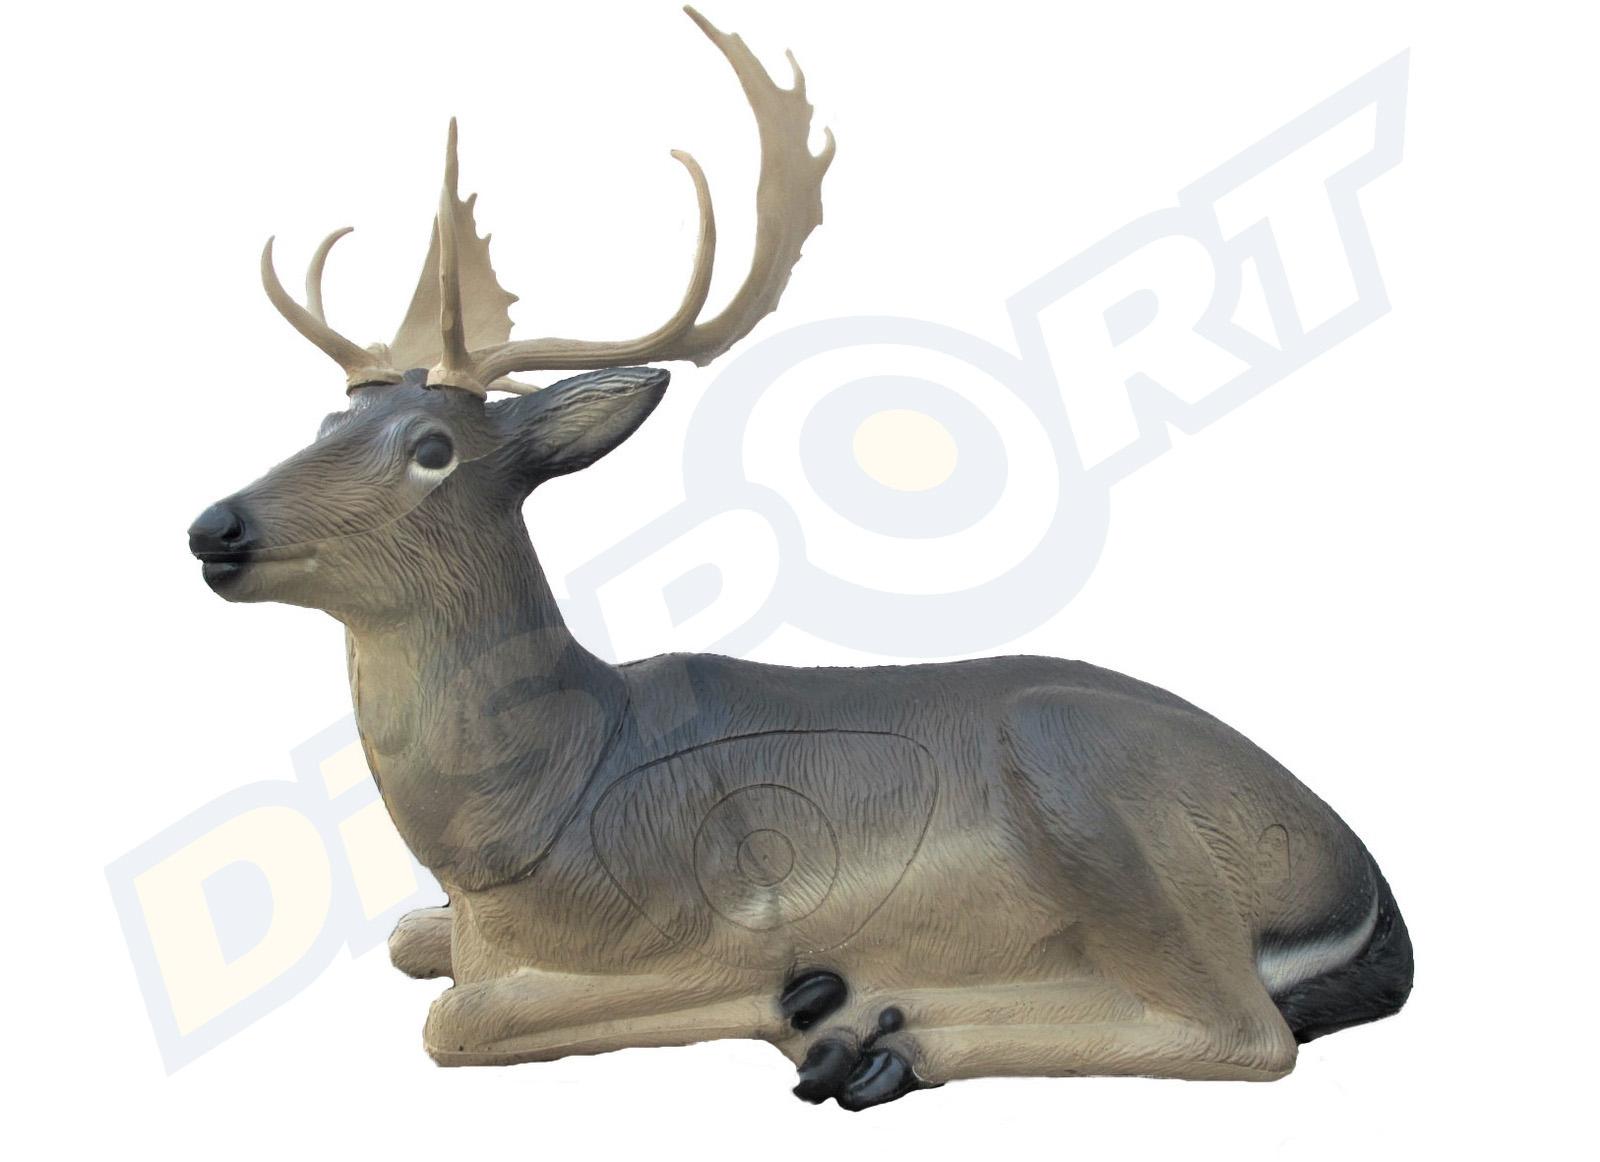 SRT TARGET 3D DAINO MELANICO SDRAIATO 08470008